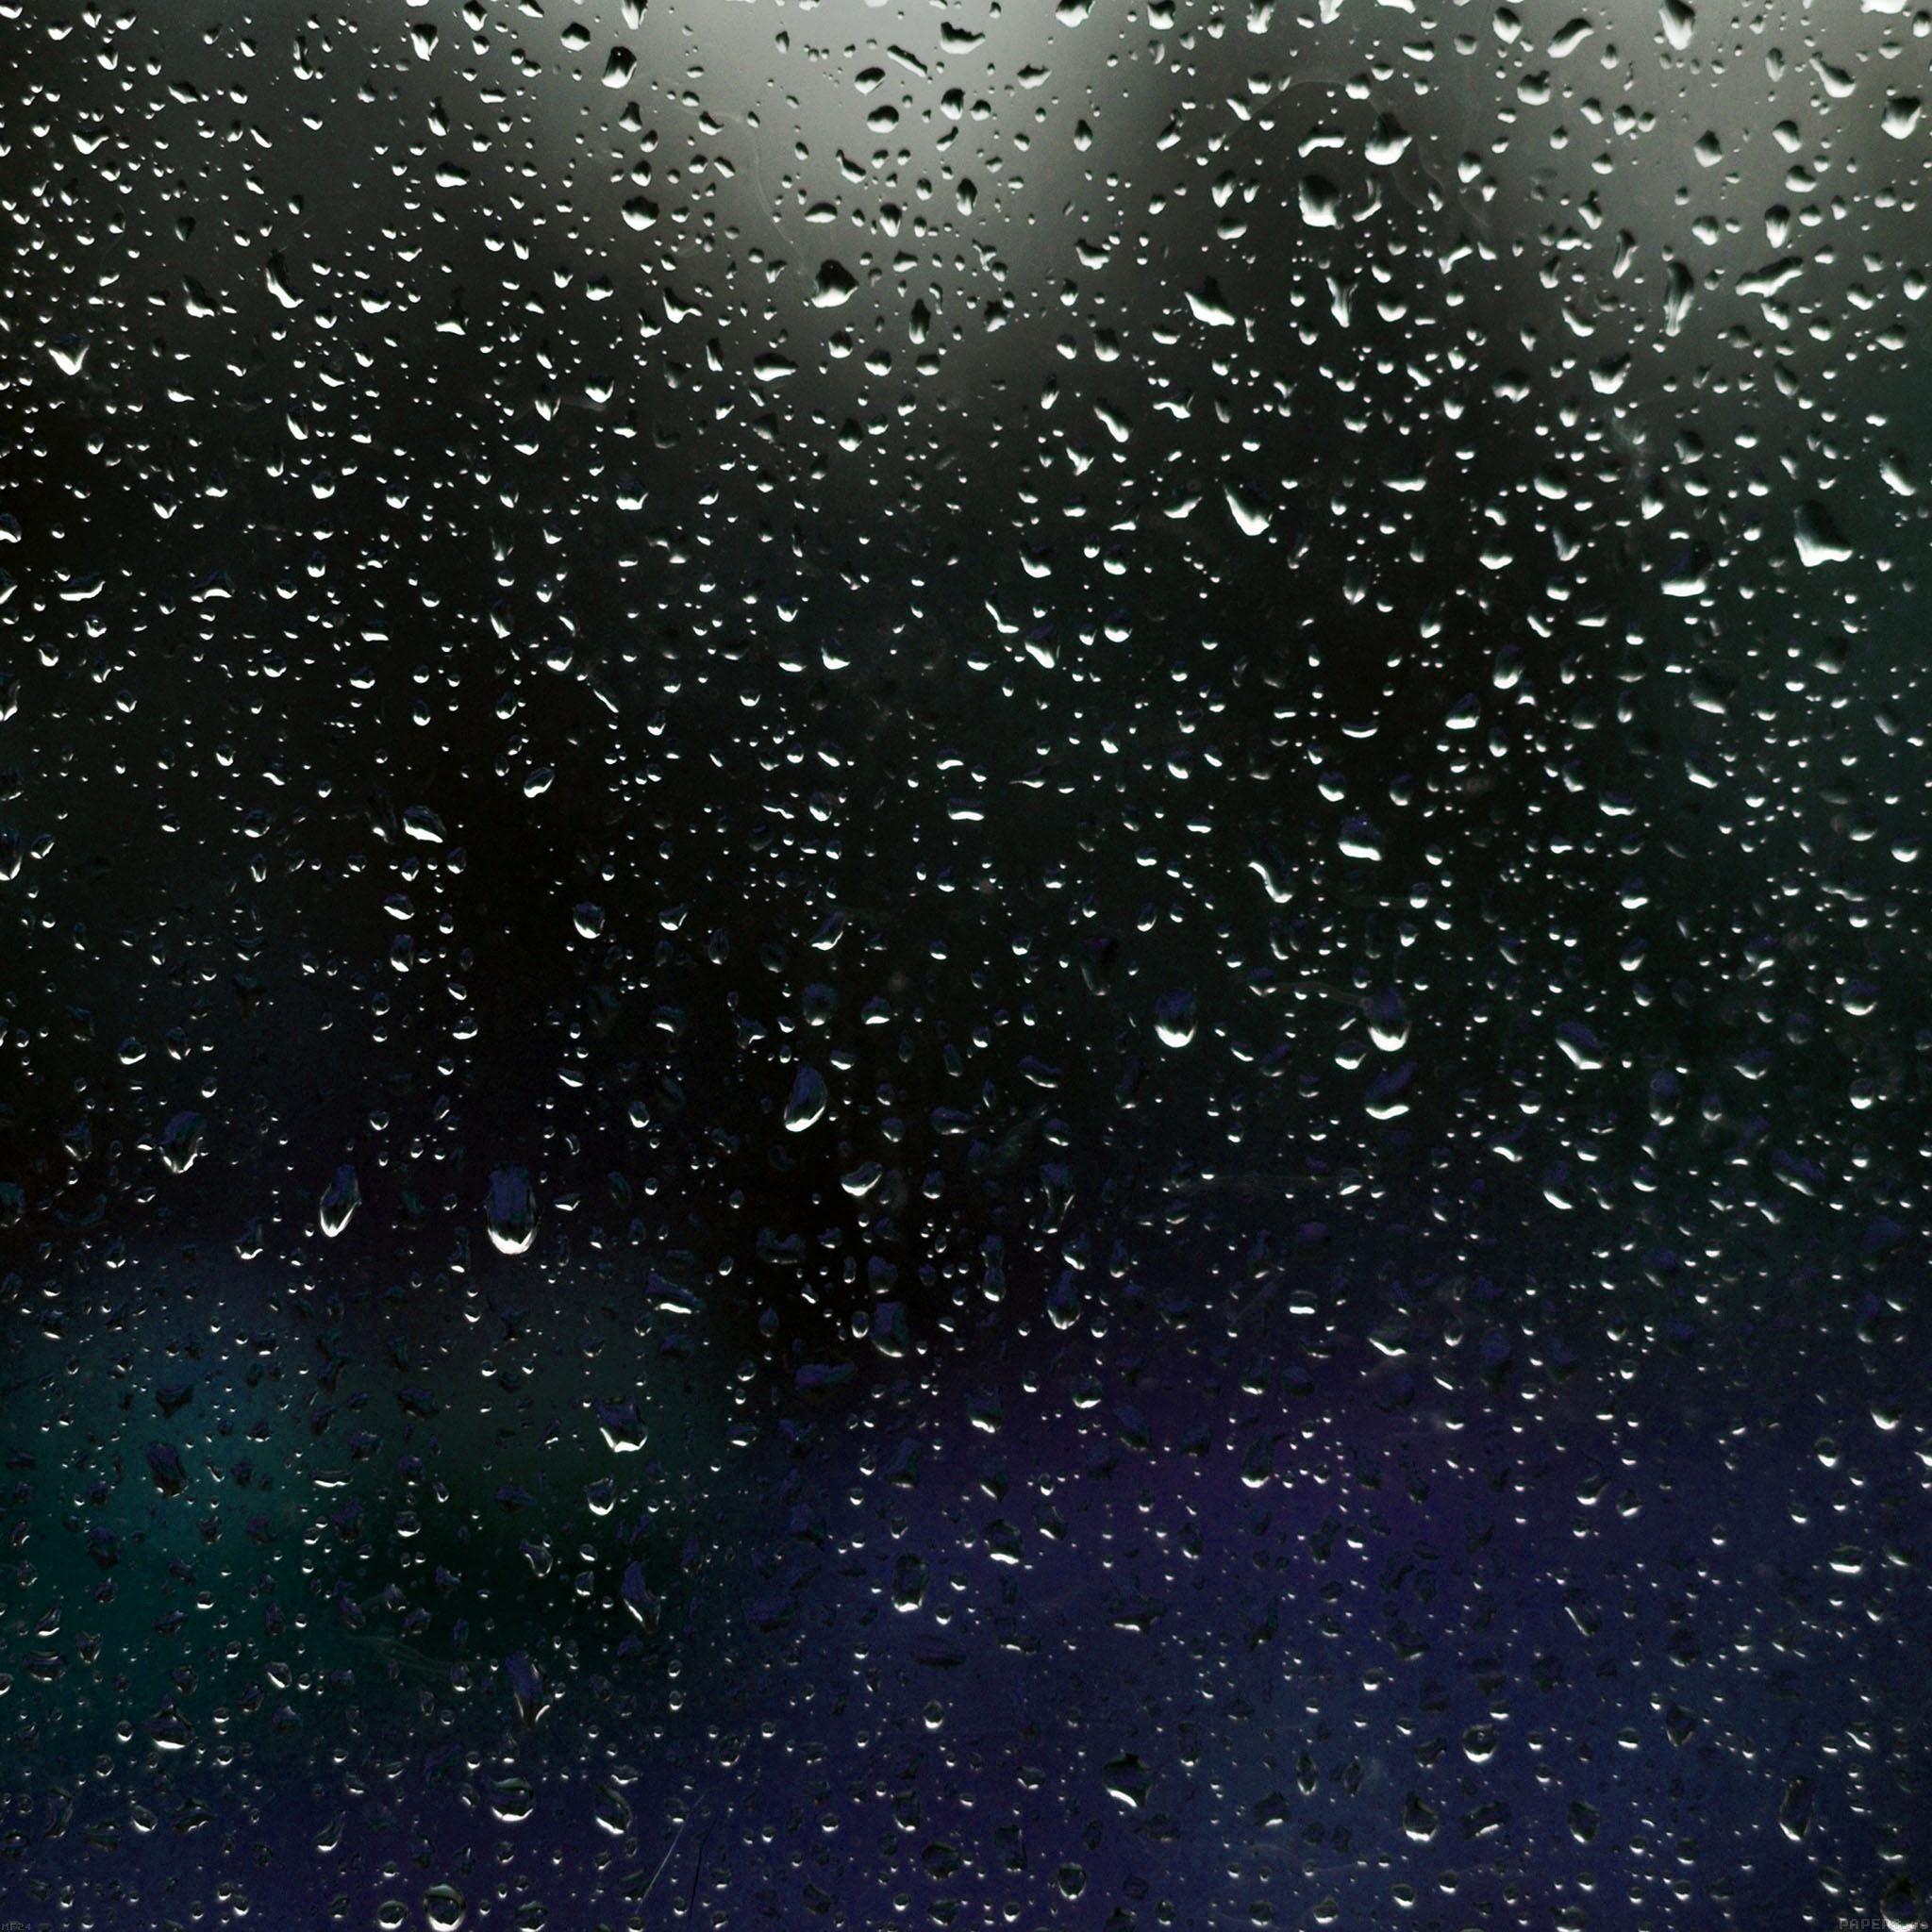 Wallpapers - Rainy nature hd wallpaper ...